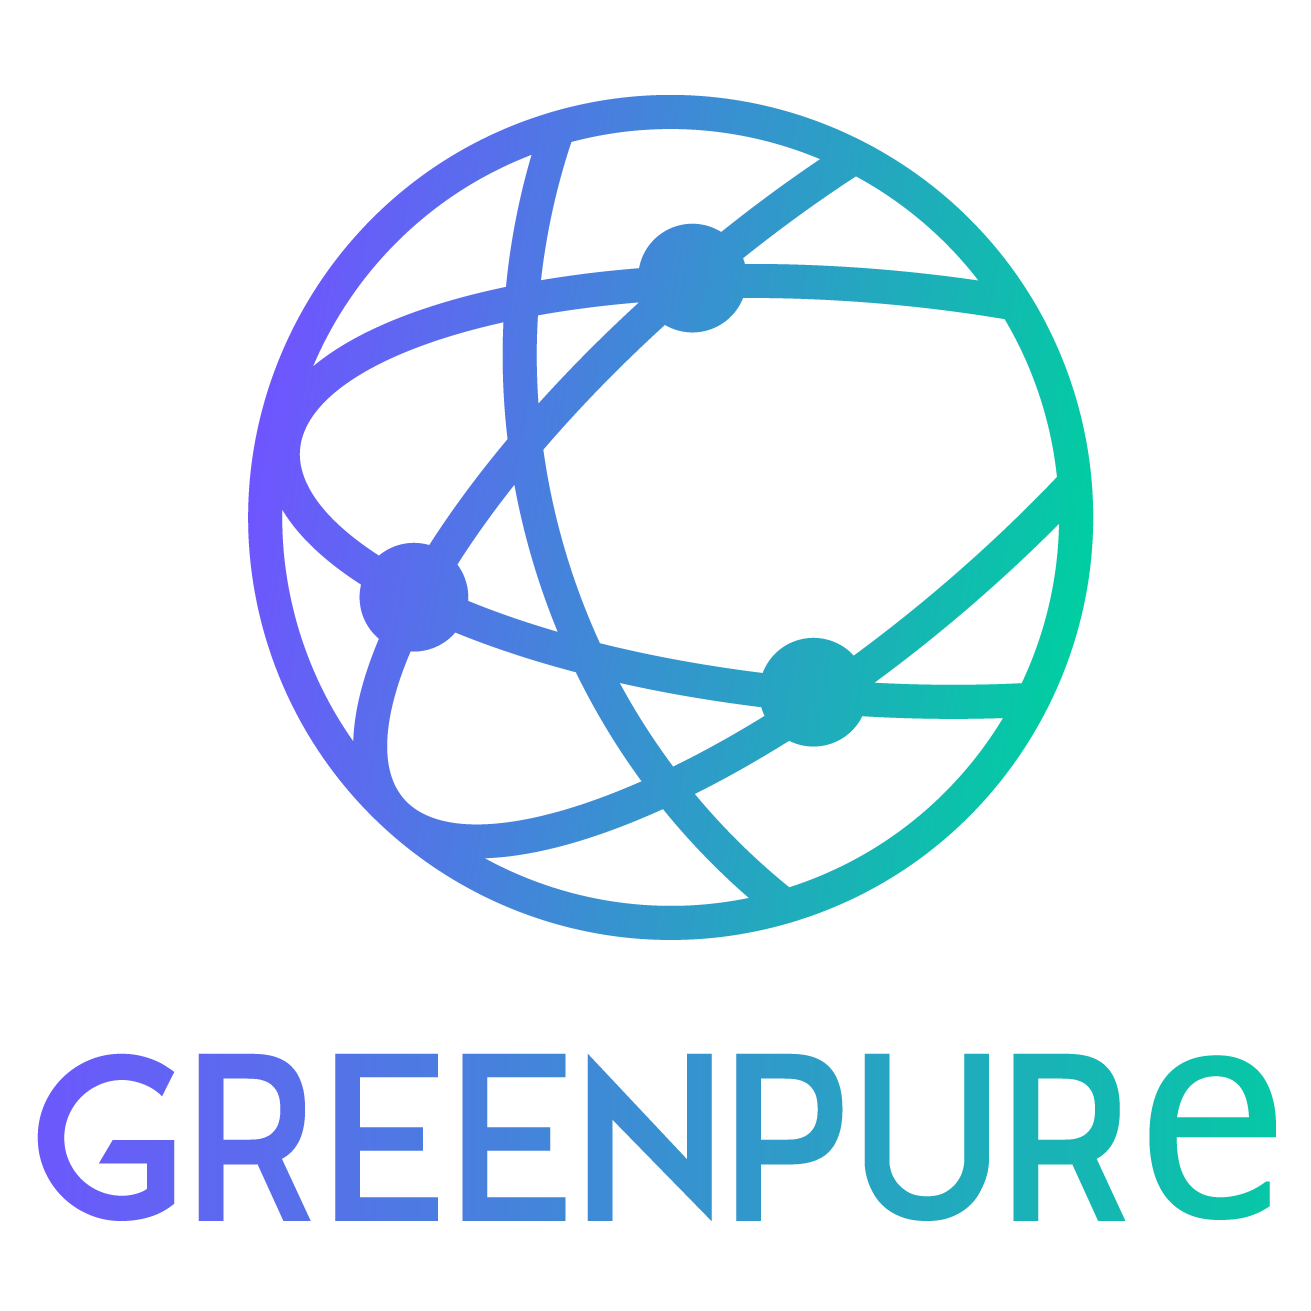 Greenpure